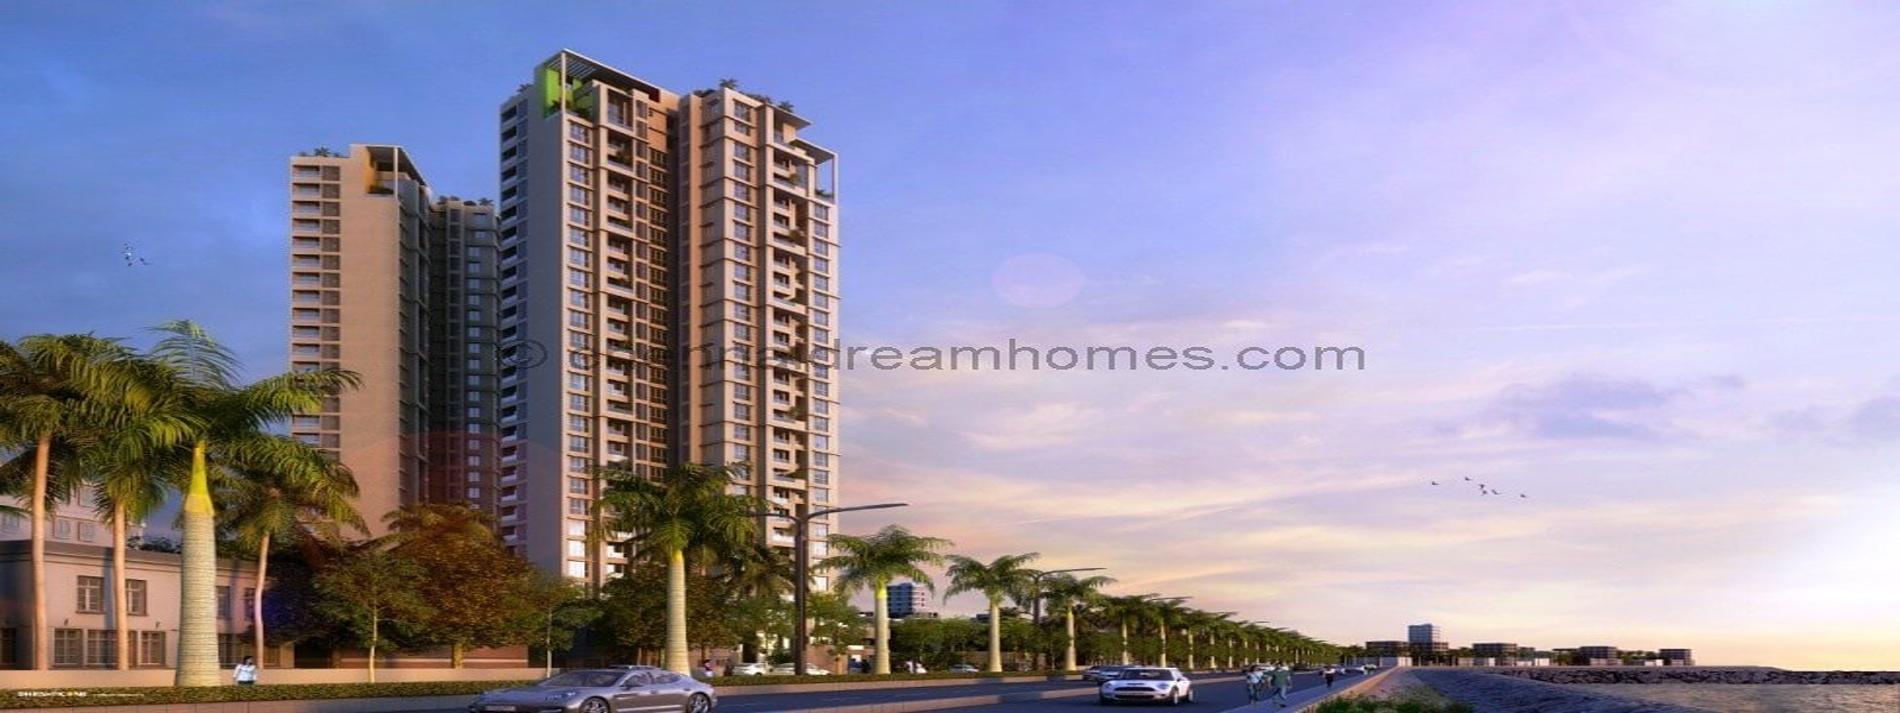 2,3 BHK Sea Facing Apartments in North Chennai